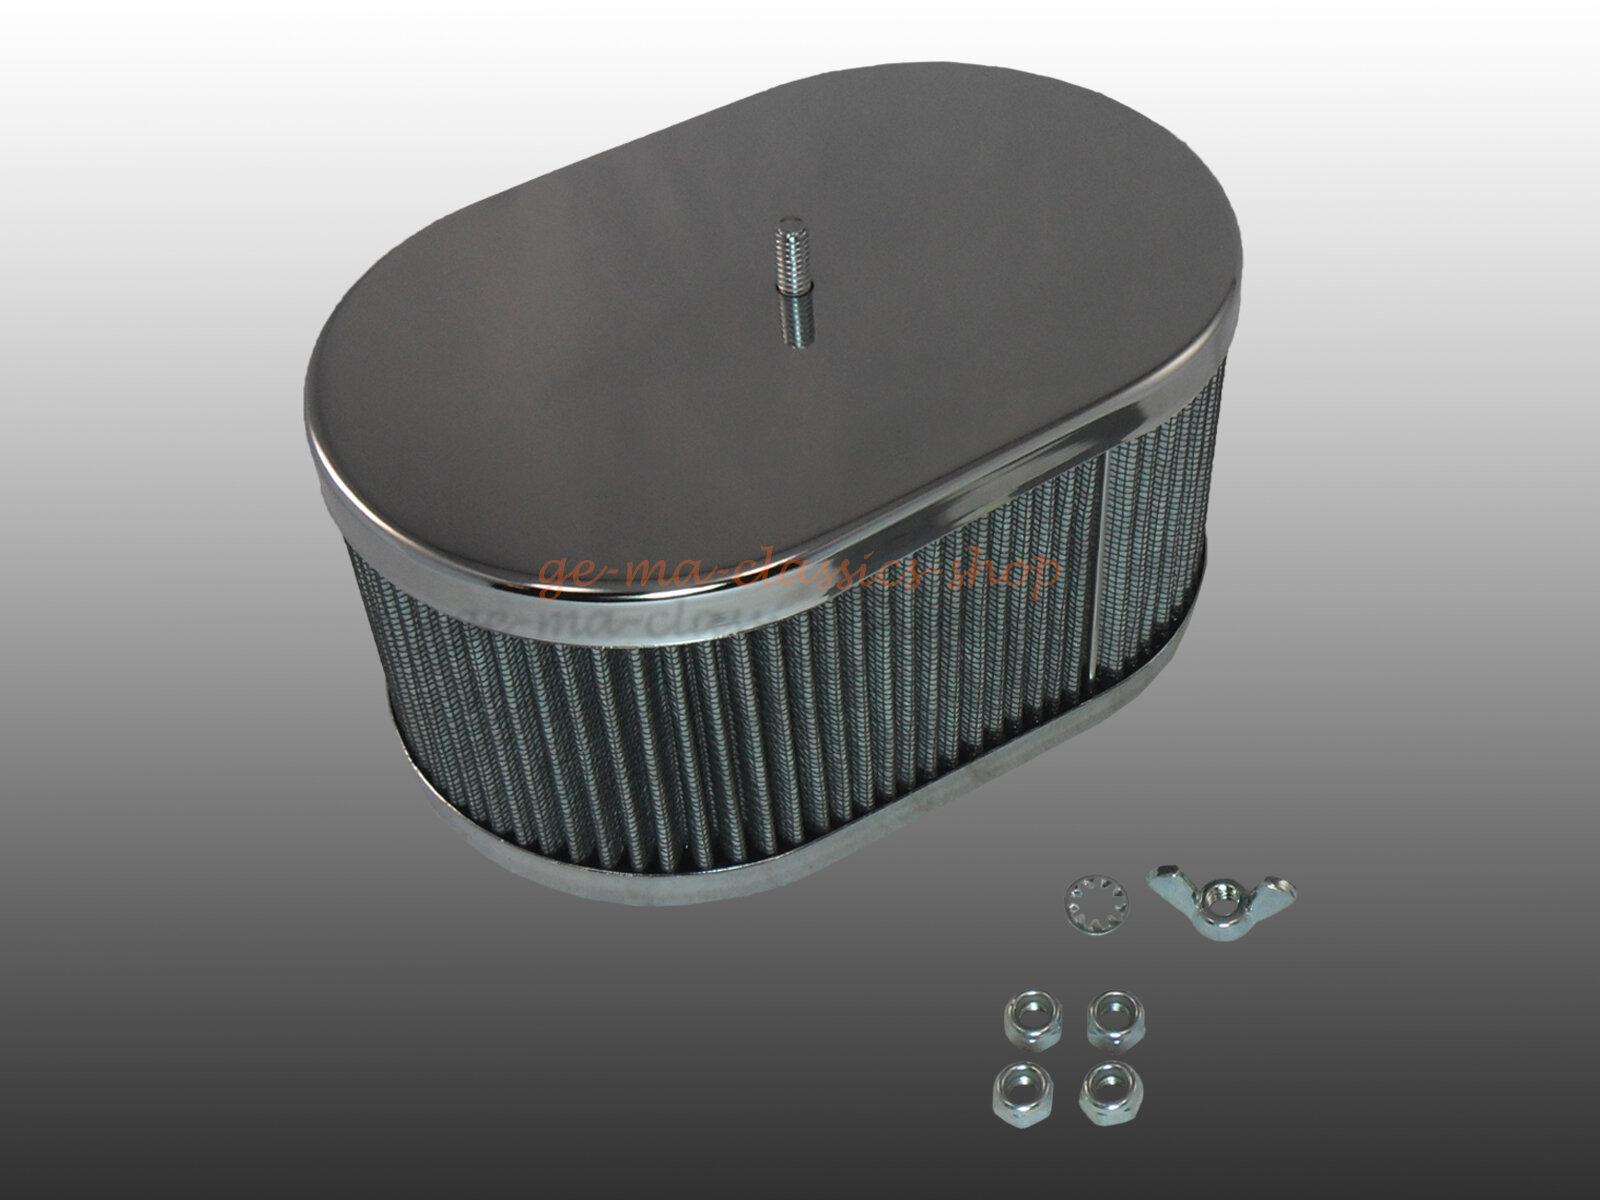 Chrom Luftfilter für VW Oval Käfer Bus Weber Vergaser Tuning